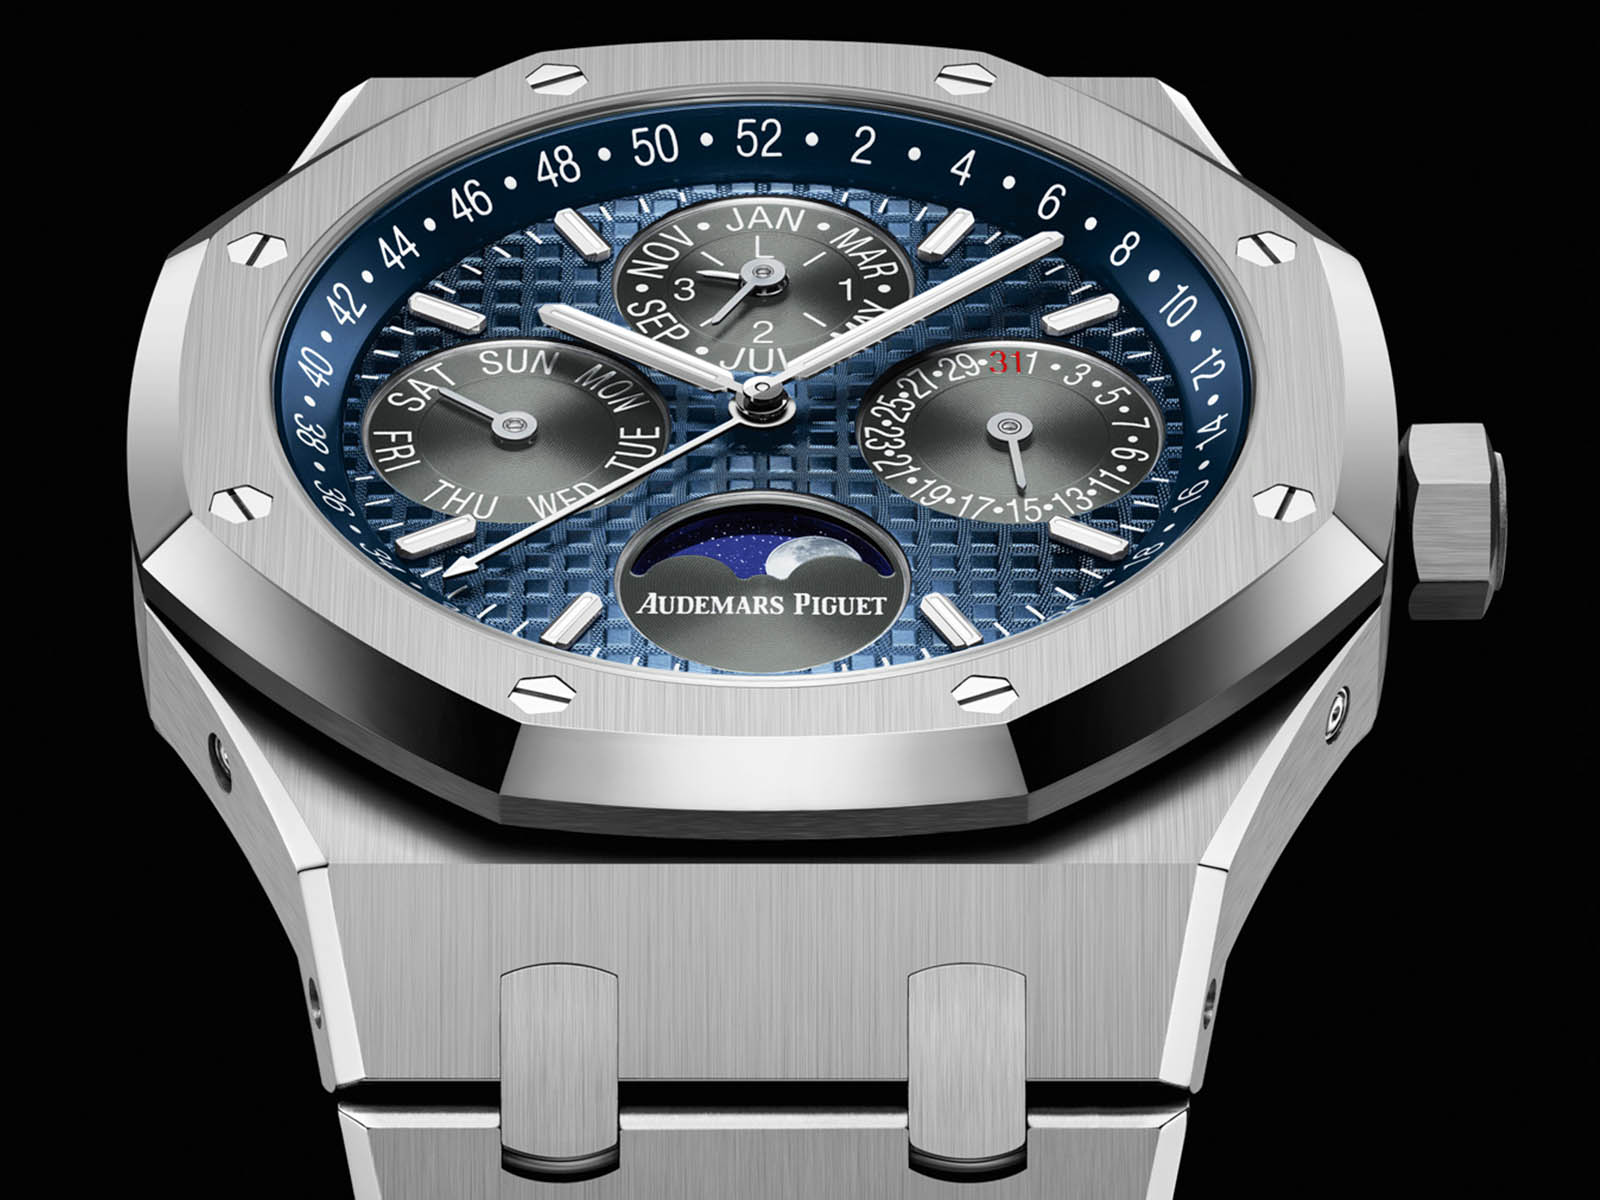 26574ti-oo-1220ti-01-audemars-piguet-royal-oak-perpetual-calendar-titanium-3.jpg